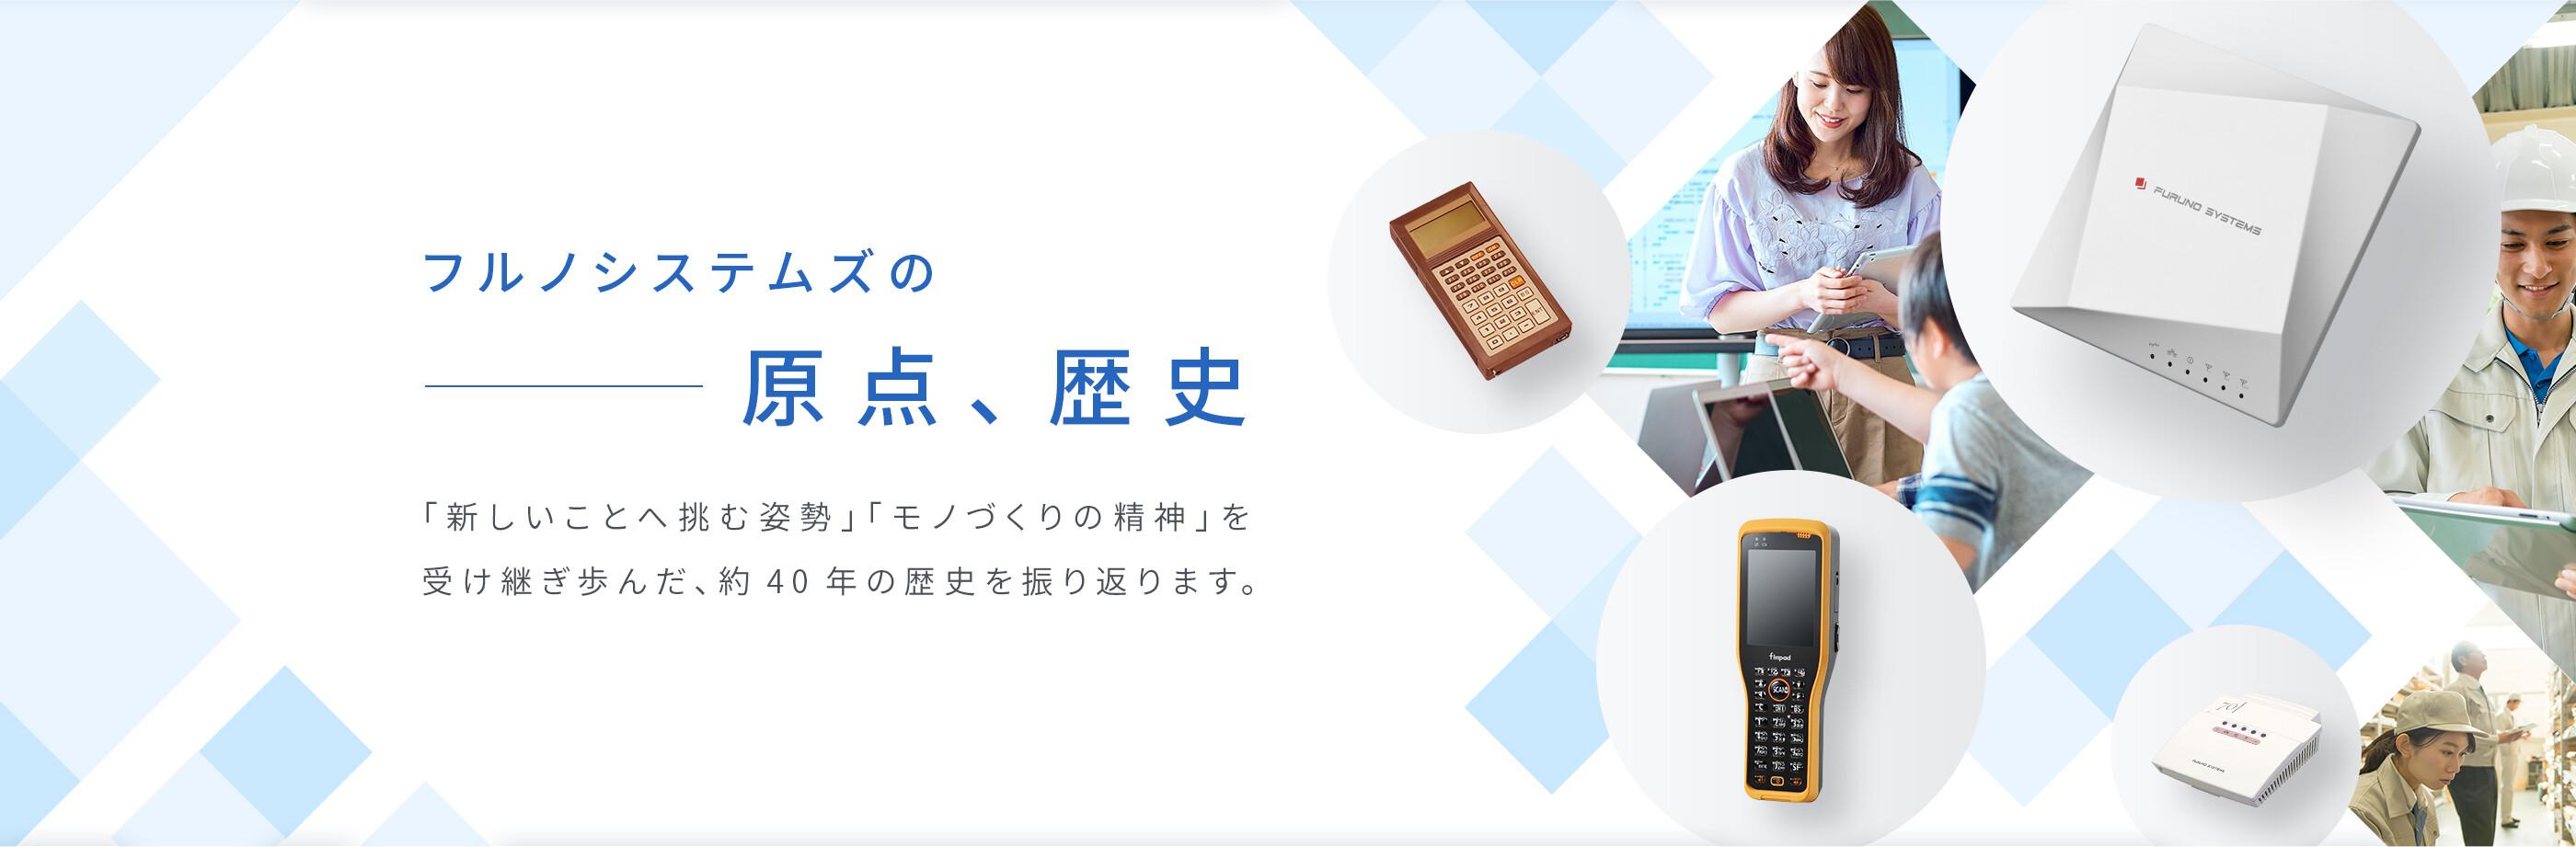 2800_920_history